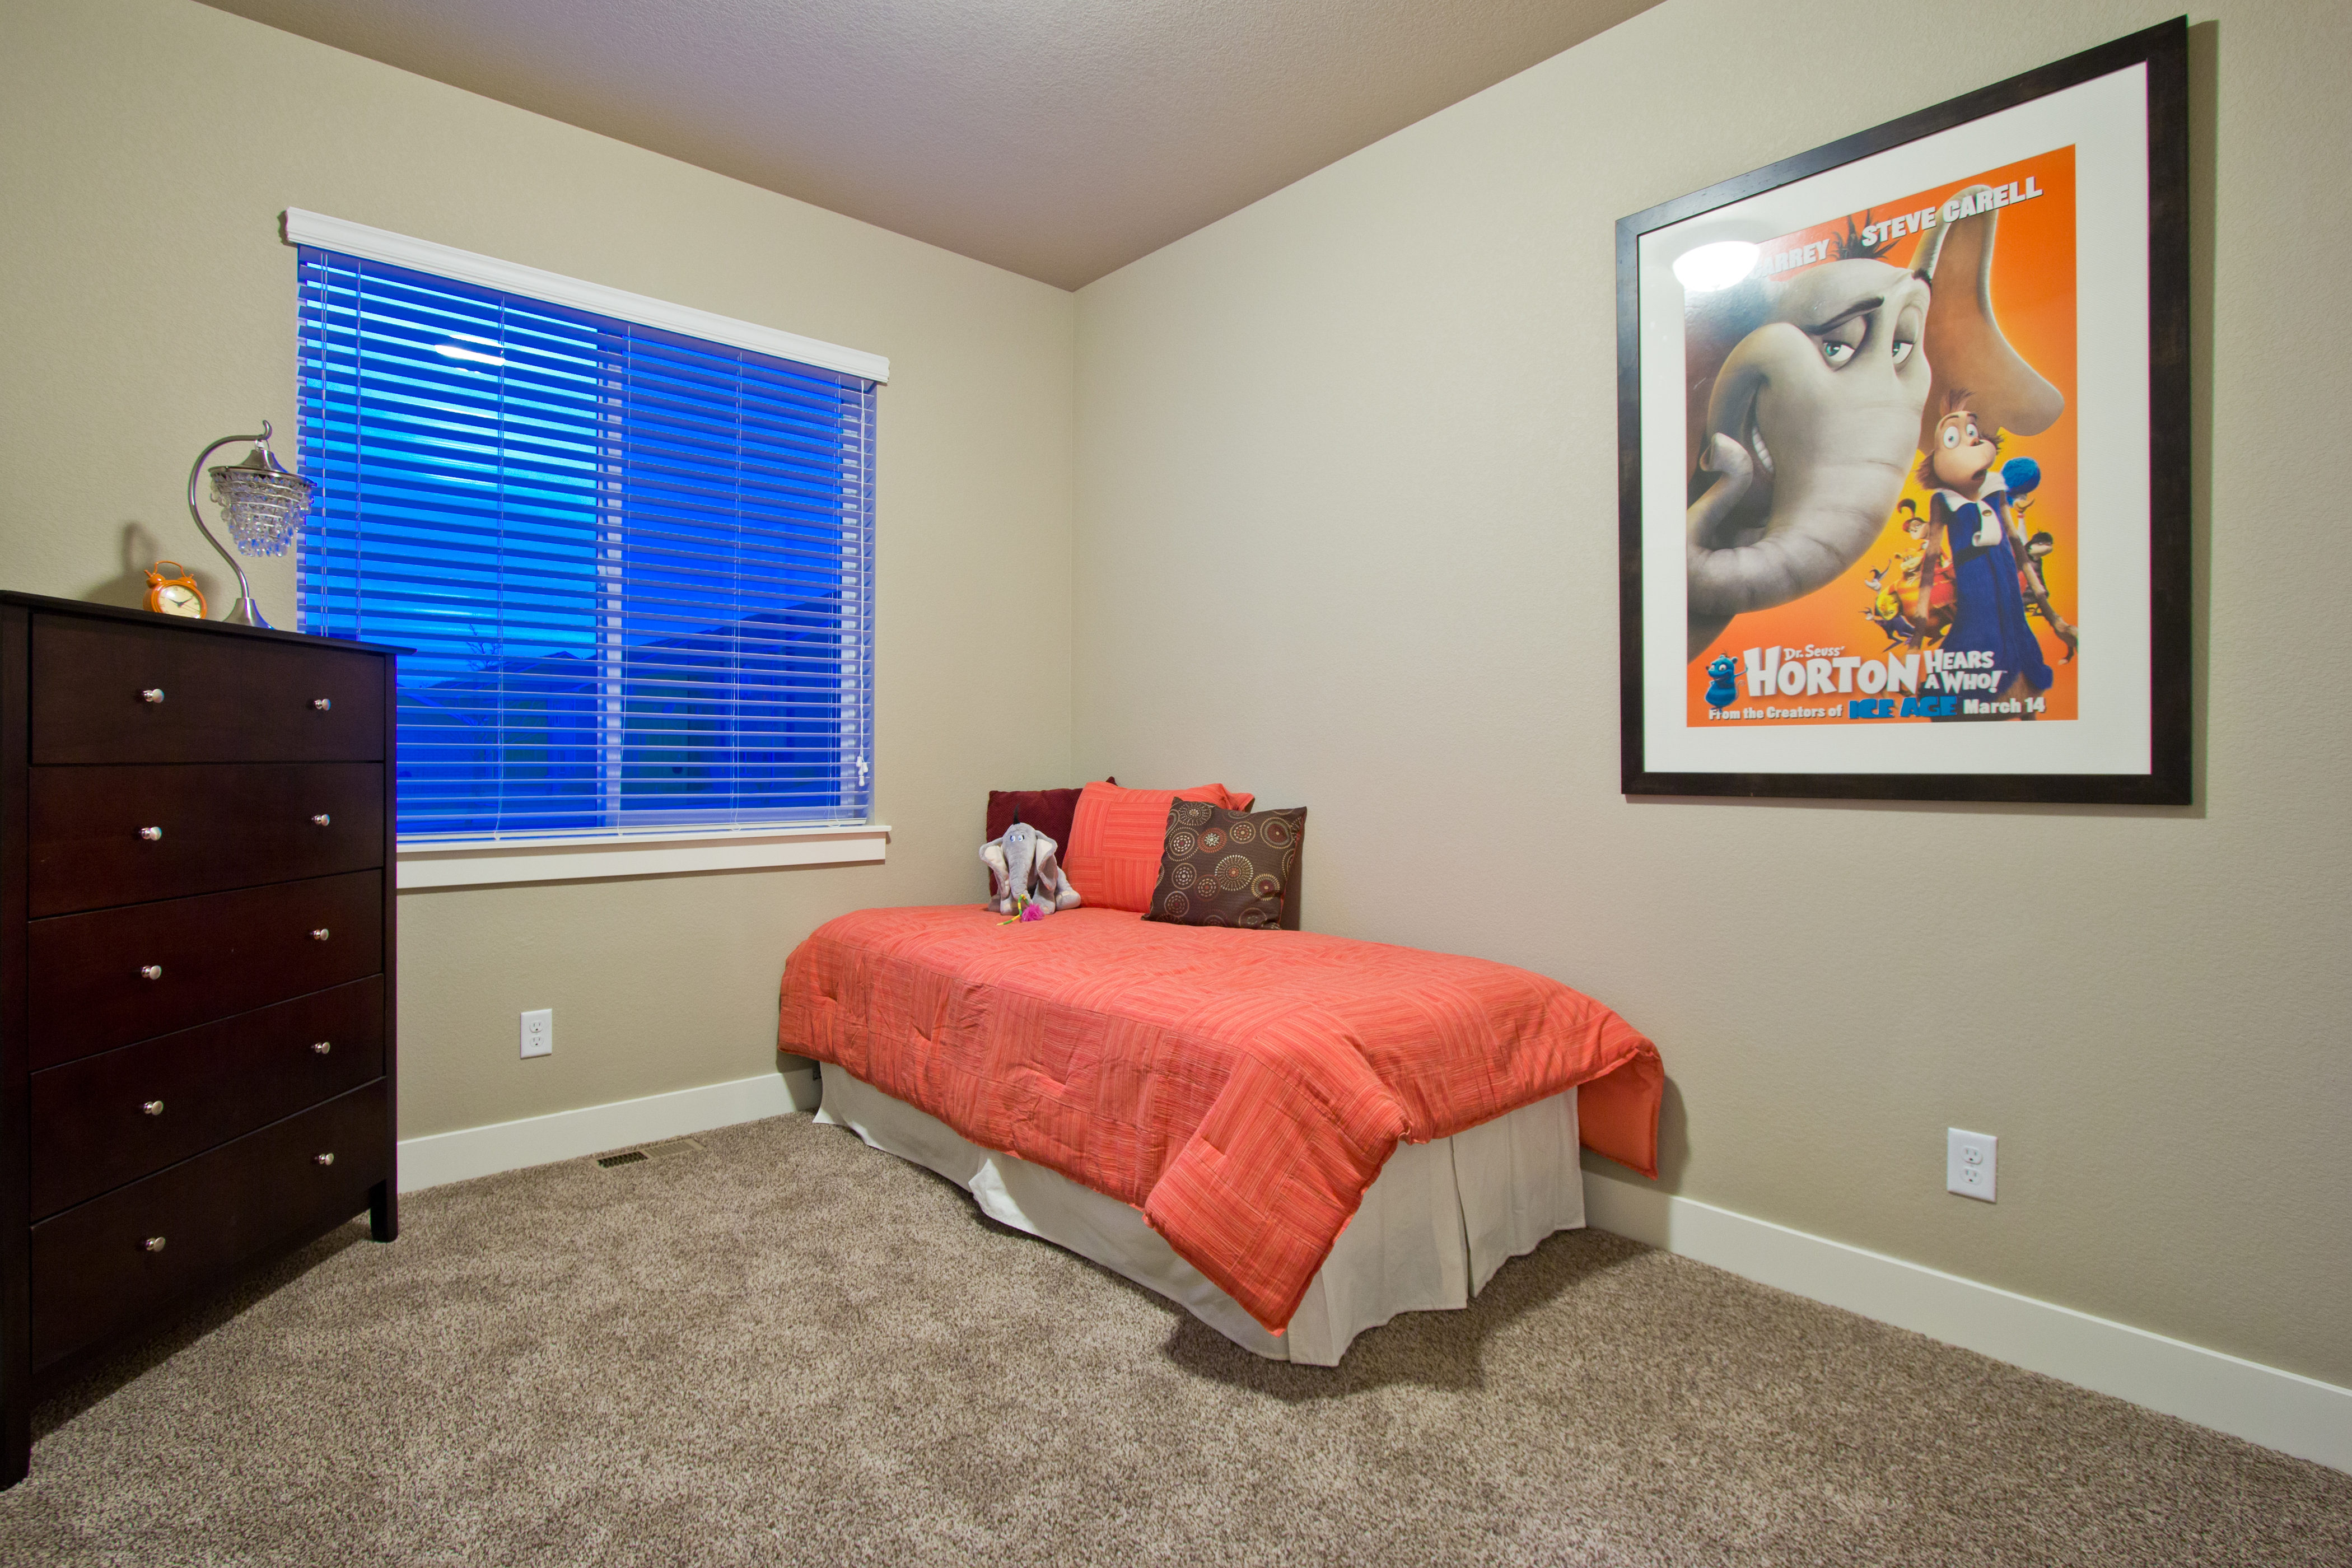 20_durango_loveland_bedroom_202_new_20_20home